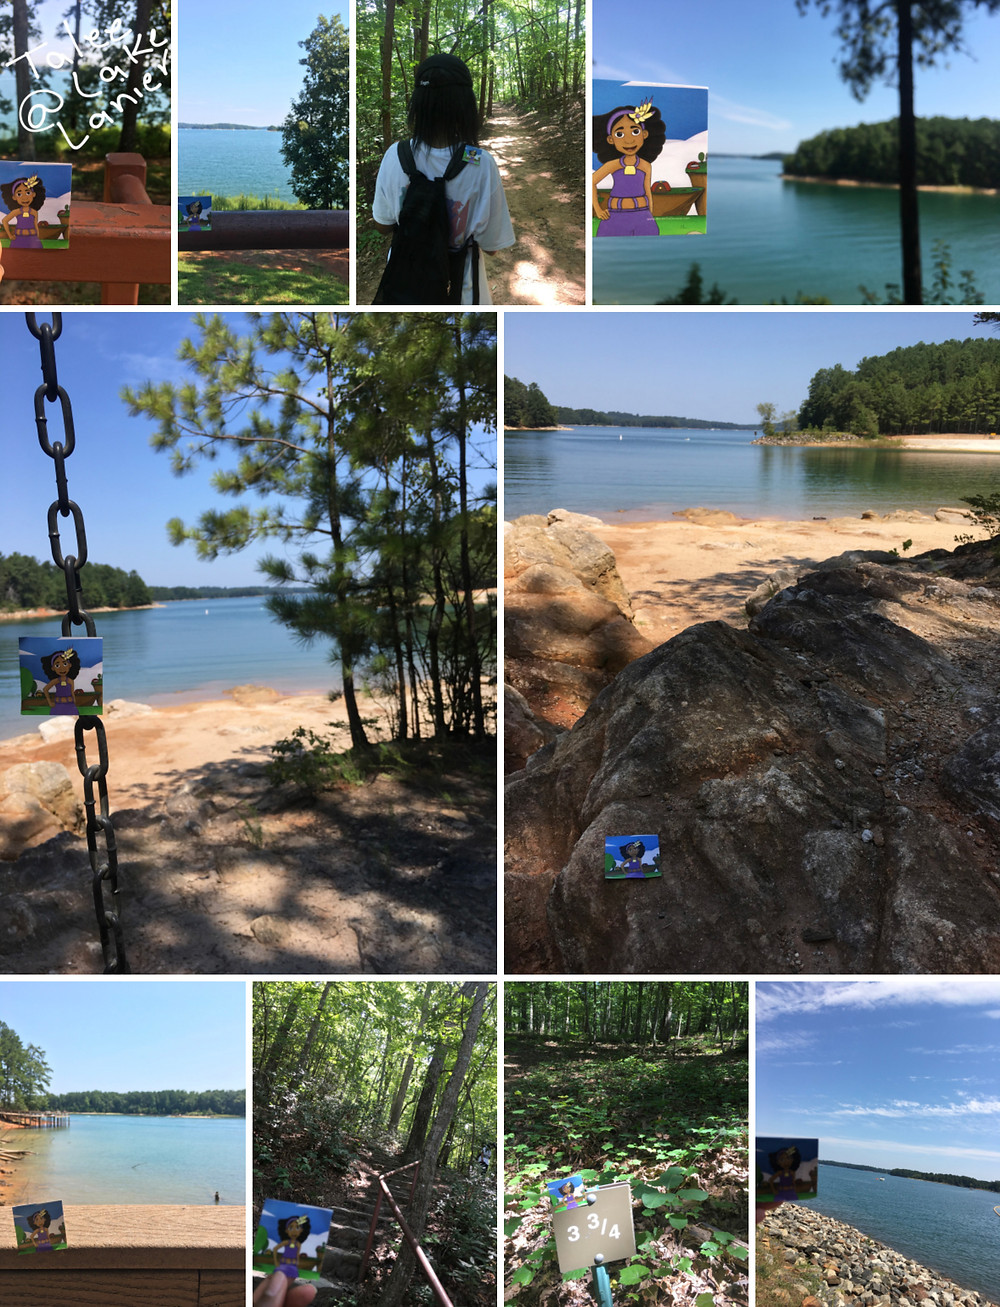 Talee at Lake Lanier